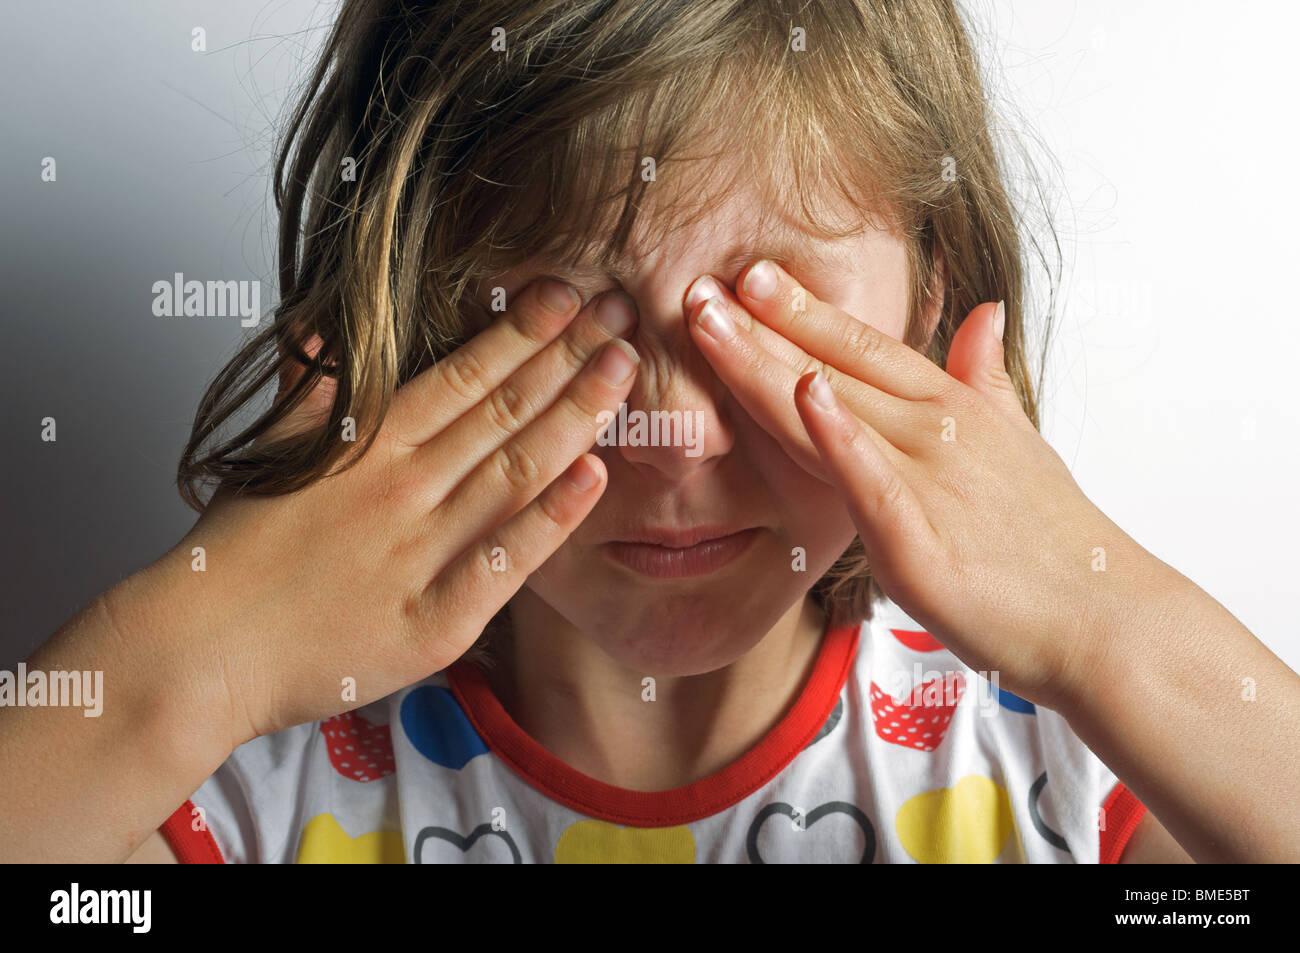 6-year old girl wiping eyes after sobbing - Stock Image